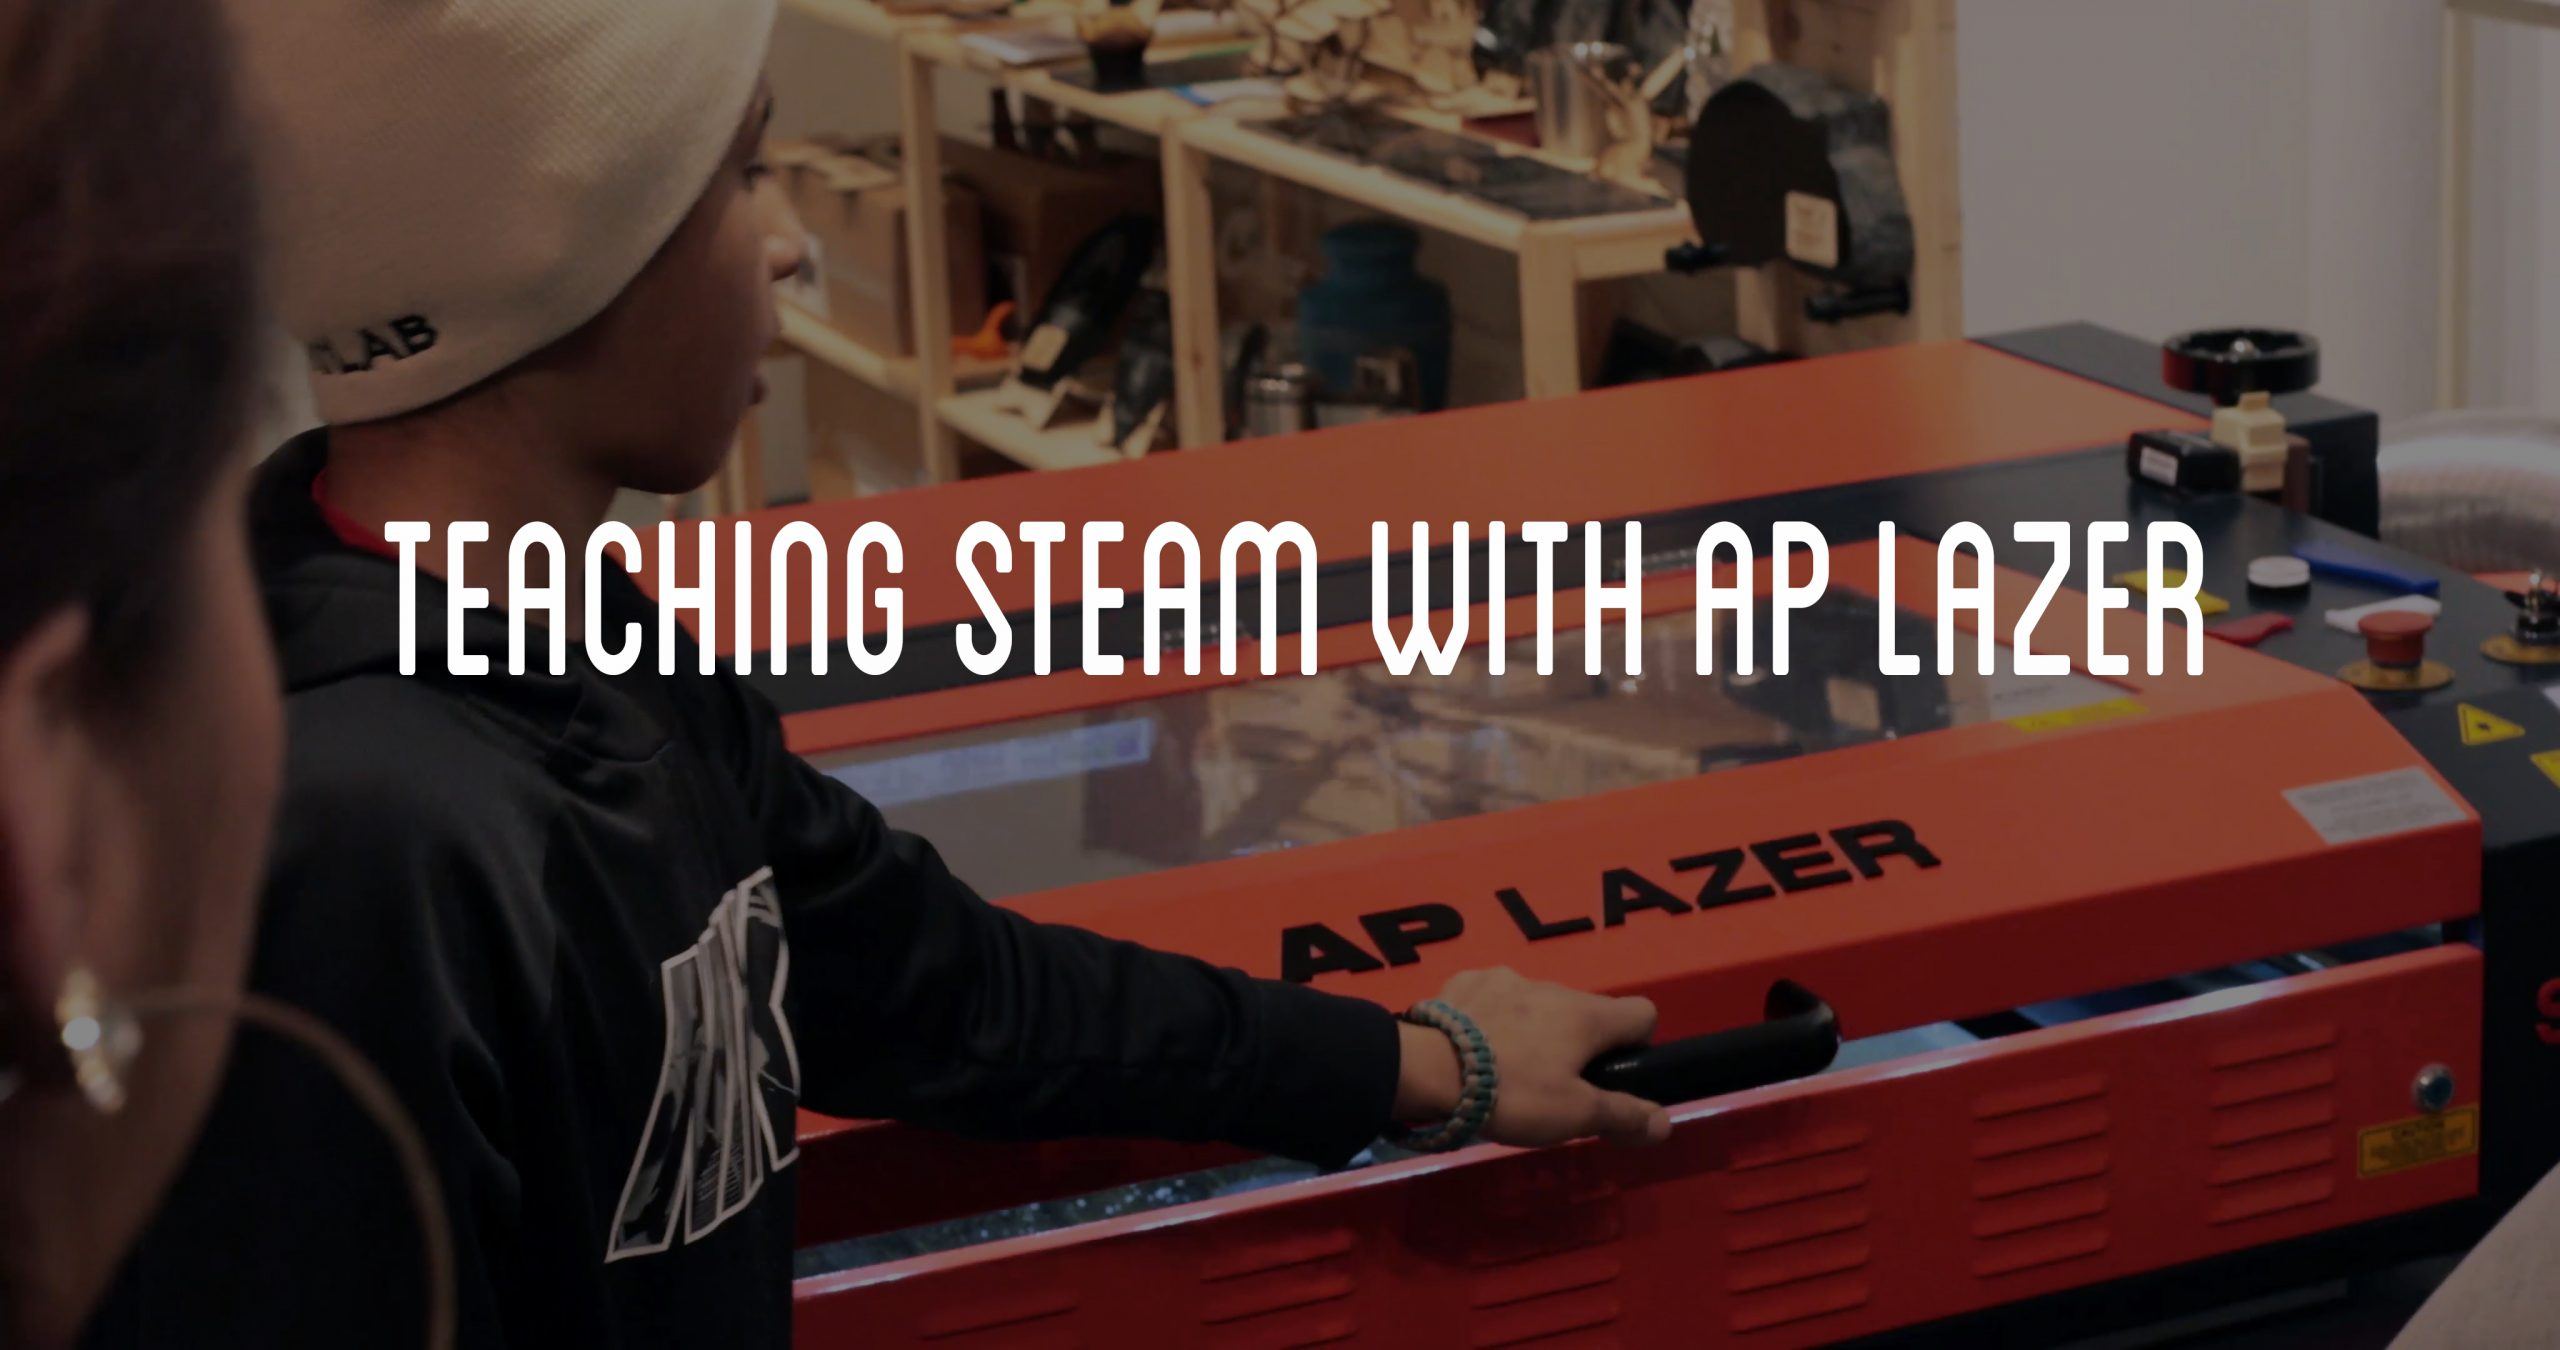 Teaching STEAM with AP Lazer